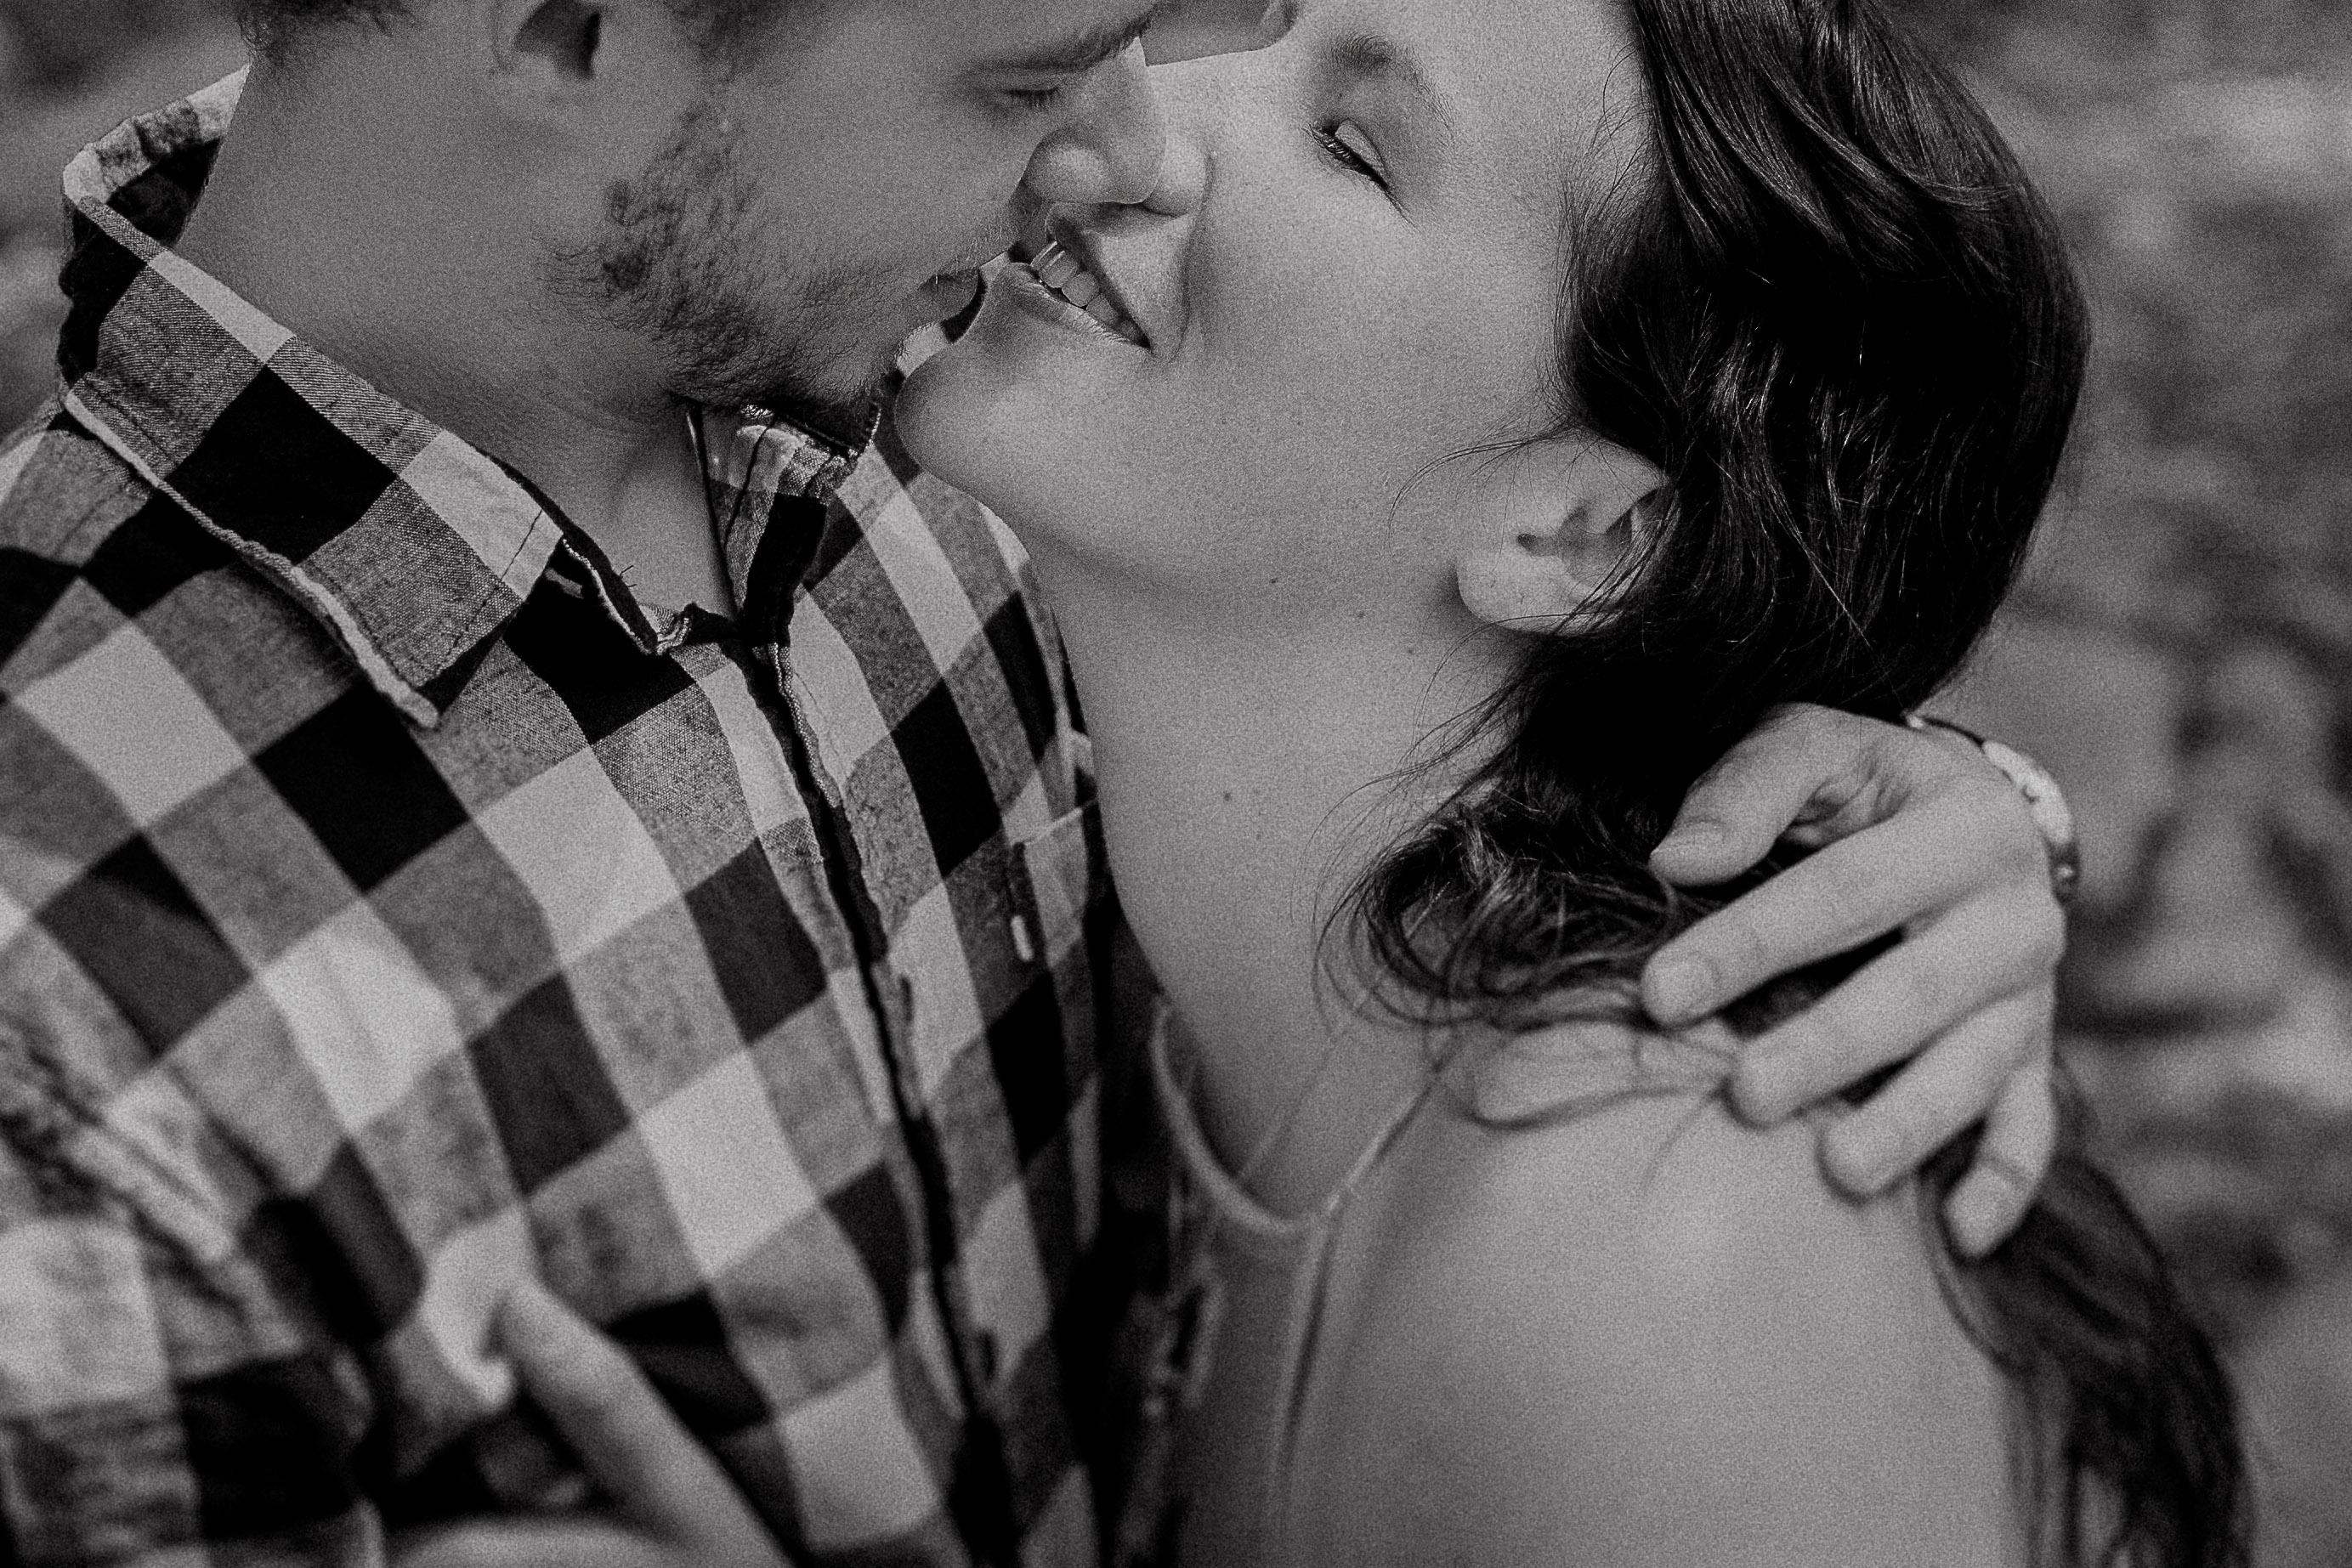 Girl and guy kissing